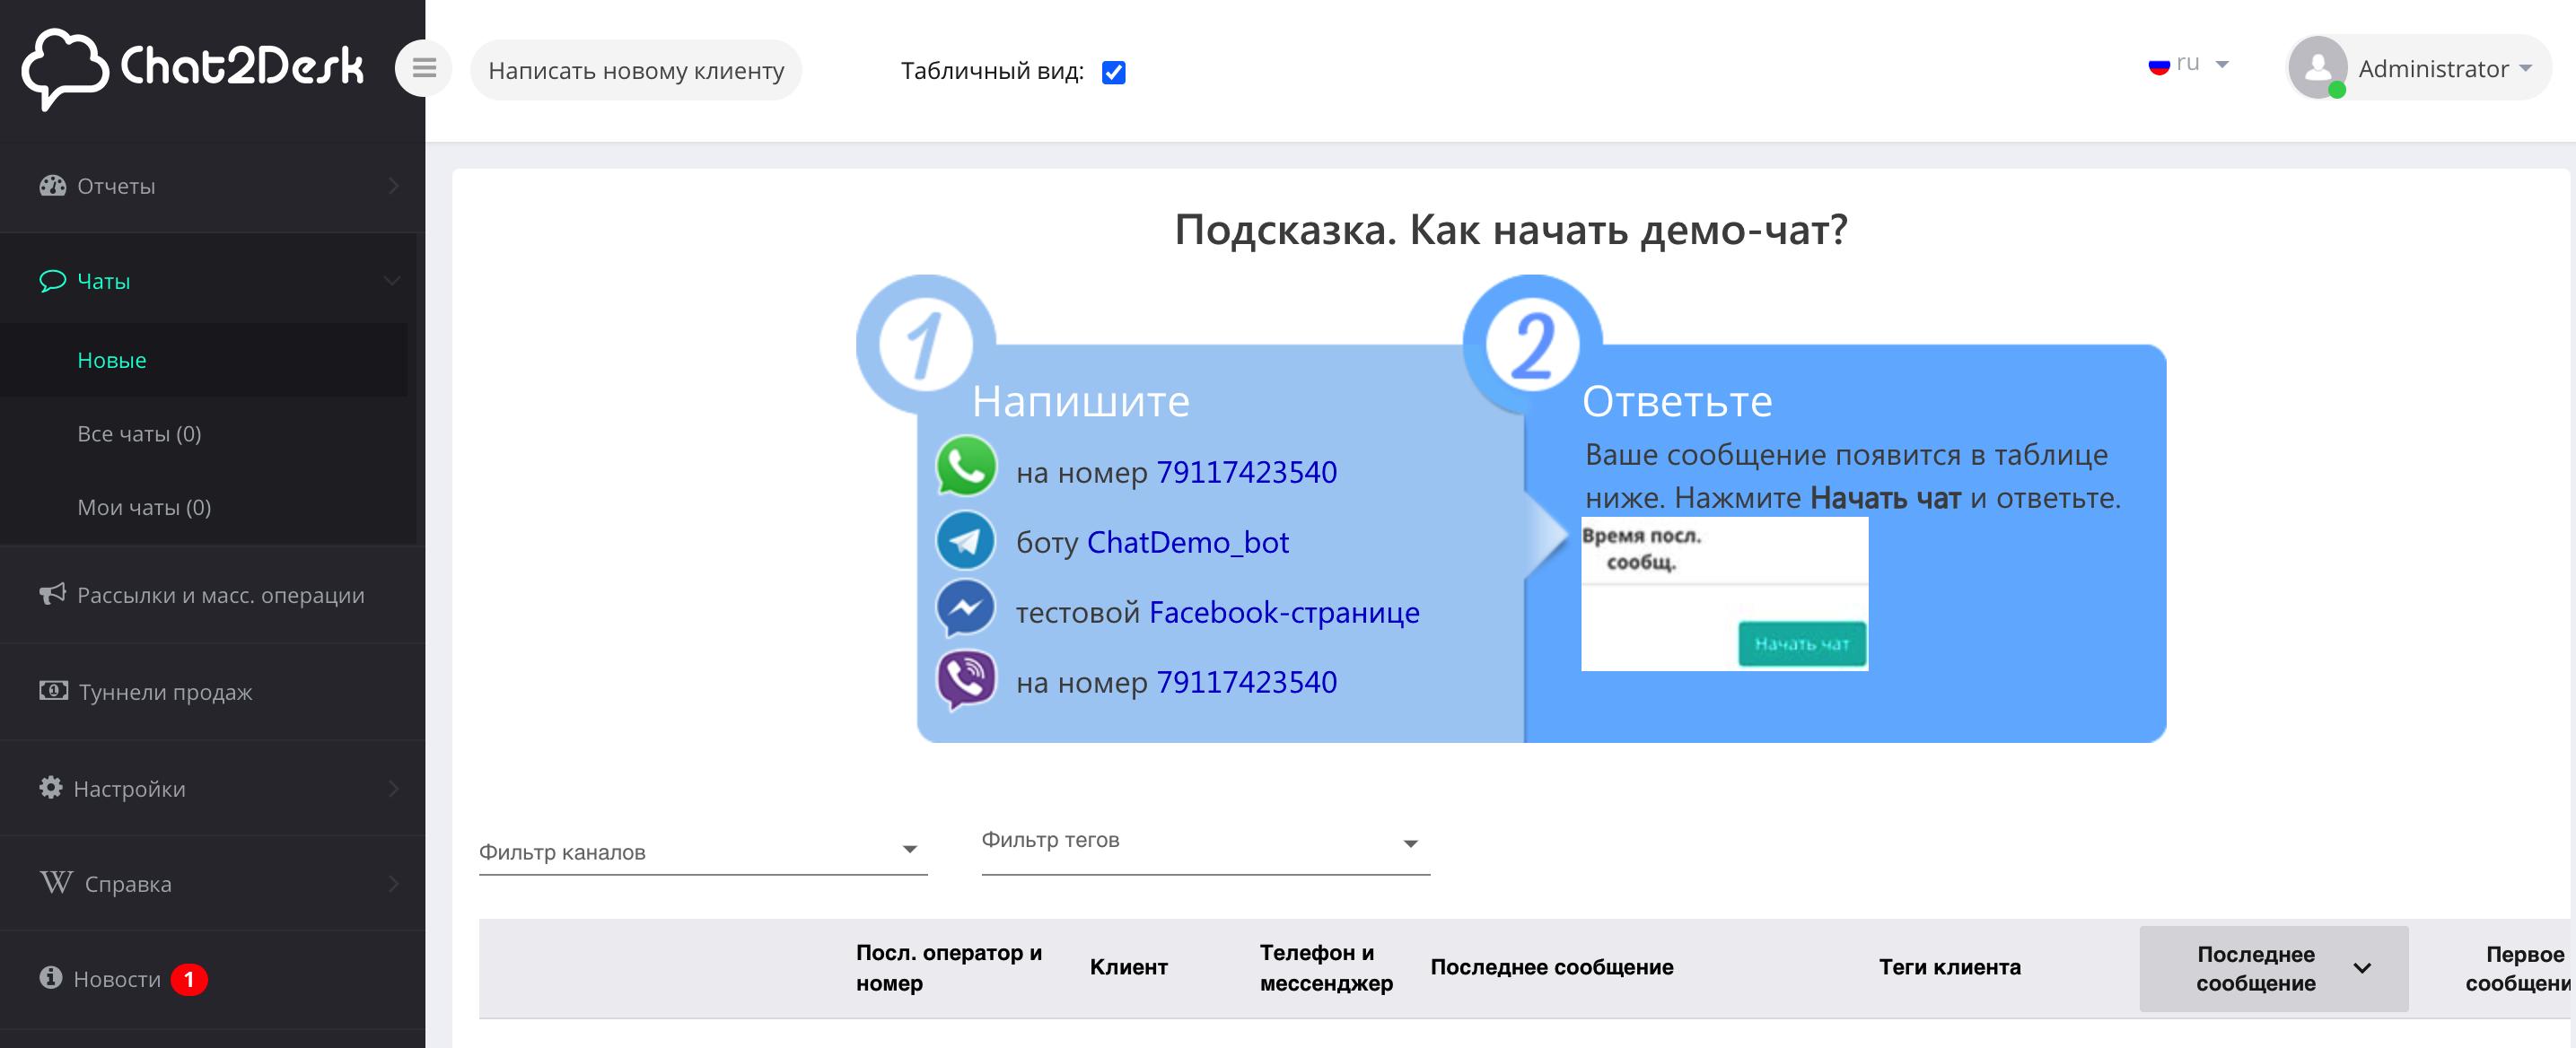 мессенджер-маркетинг в Chat2desk